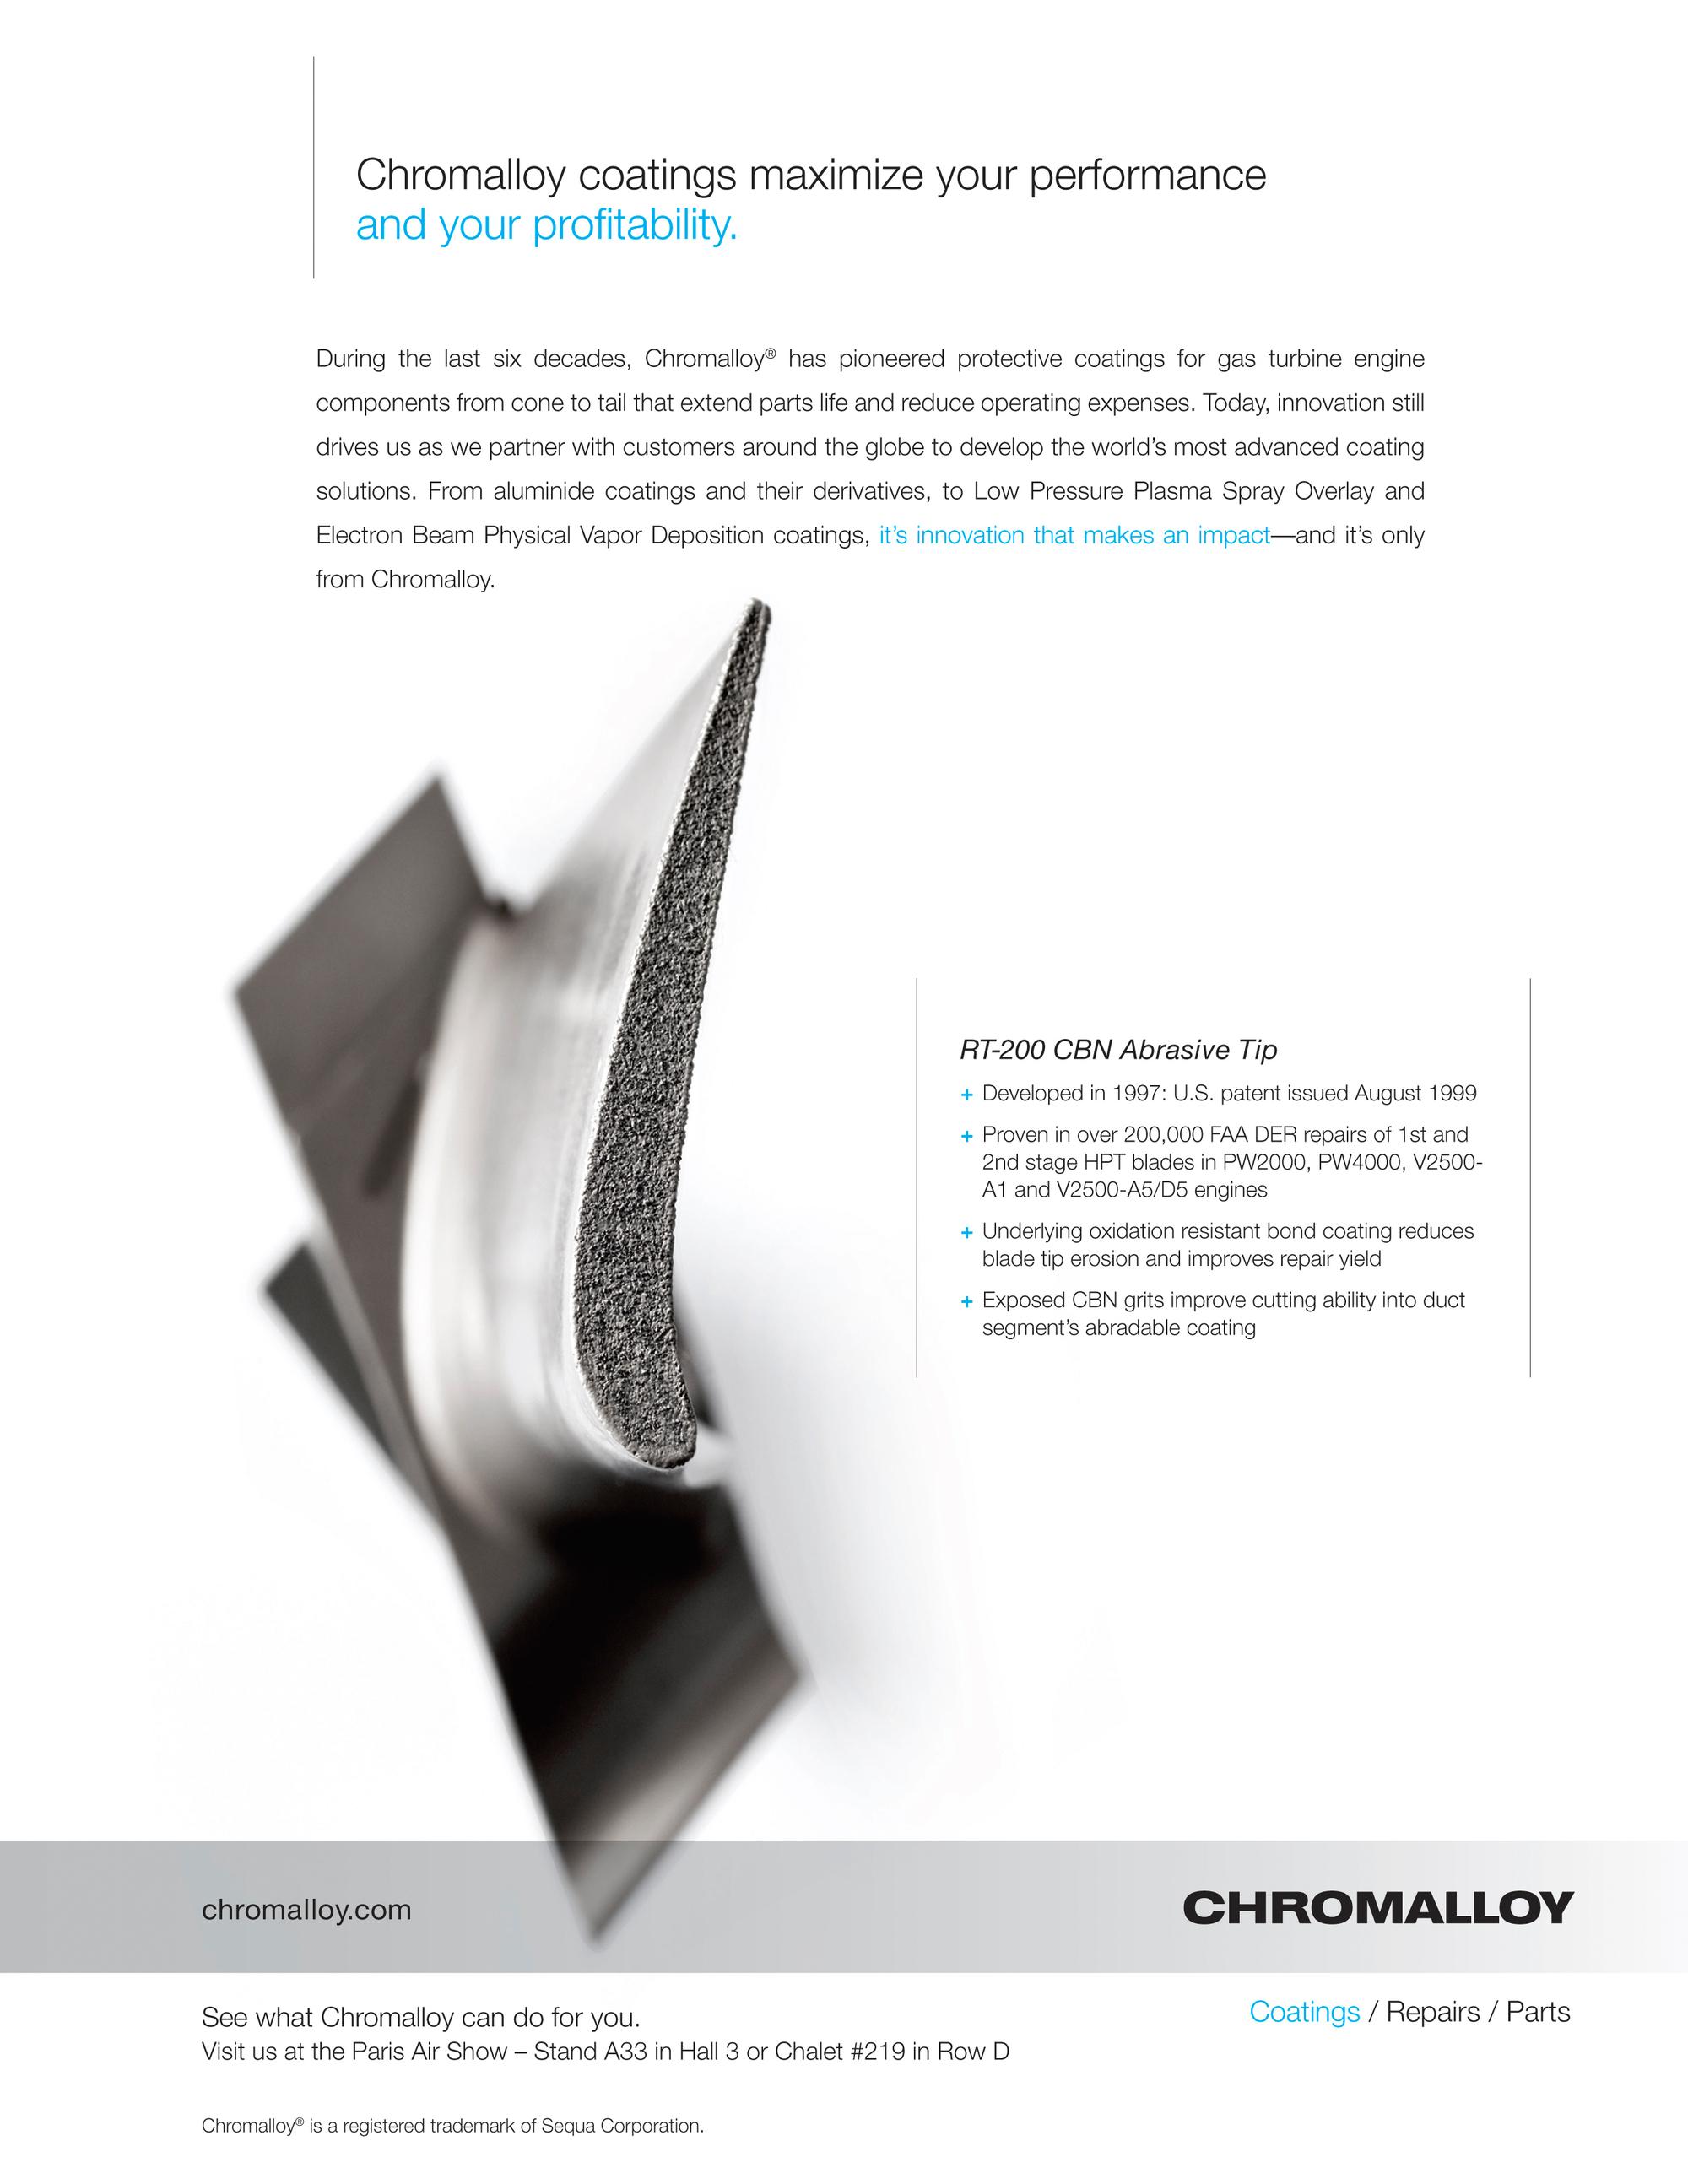 CHR-13606---final-ads-2.jpg